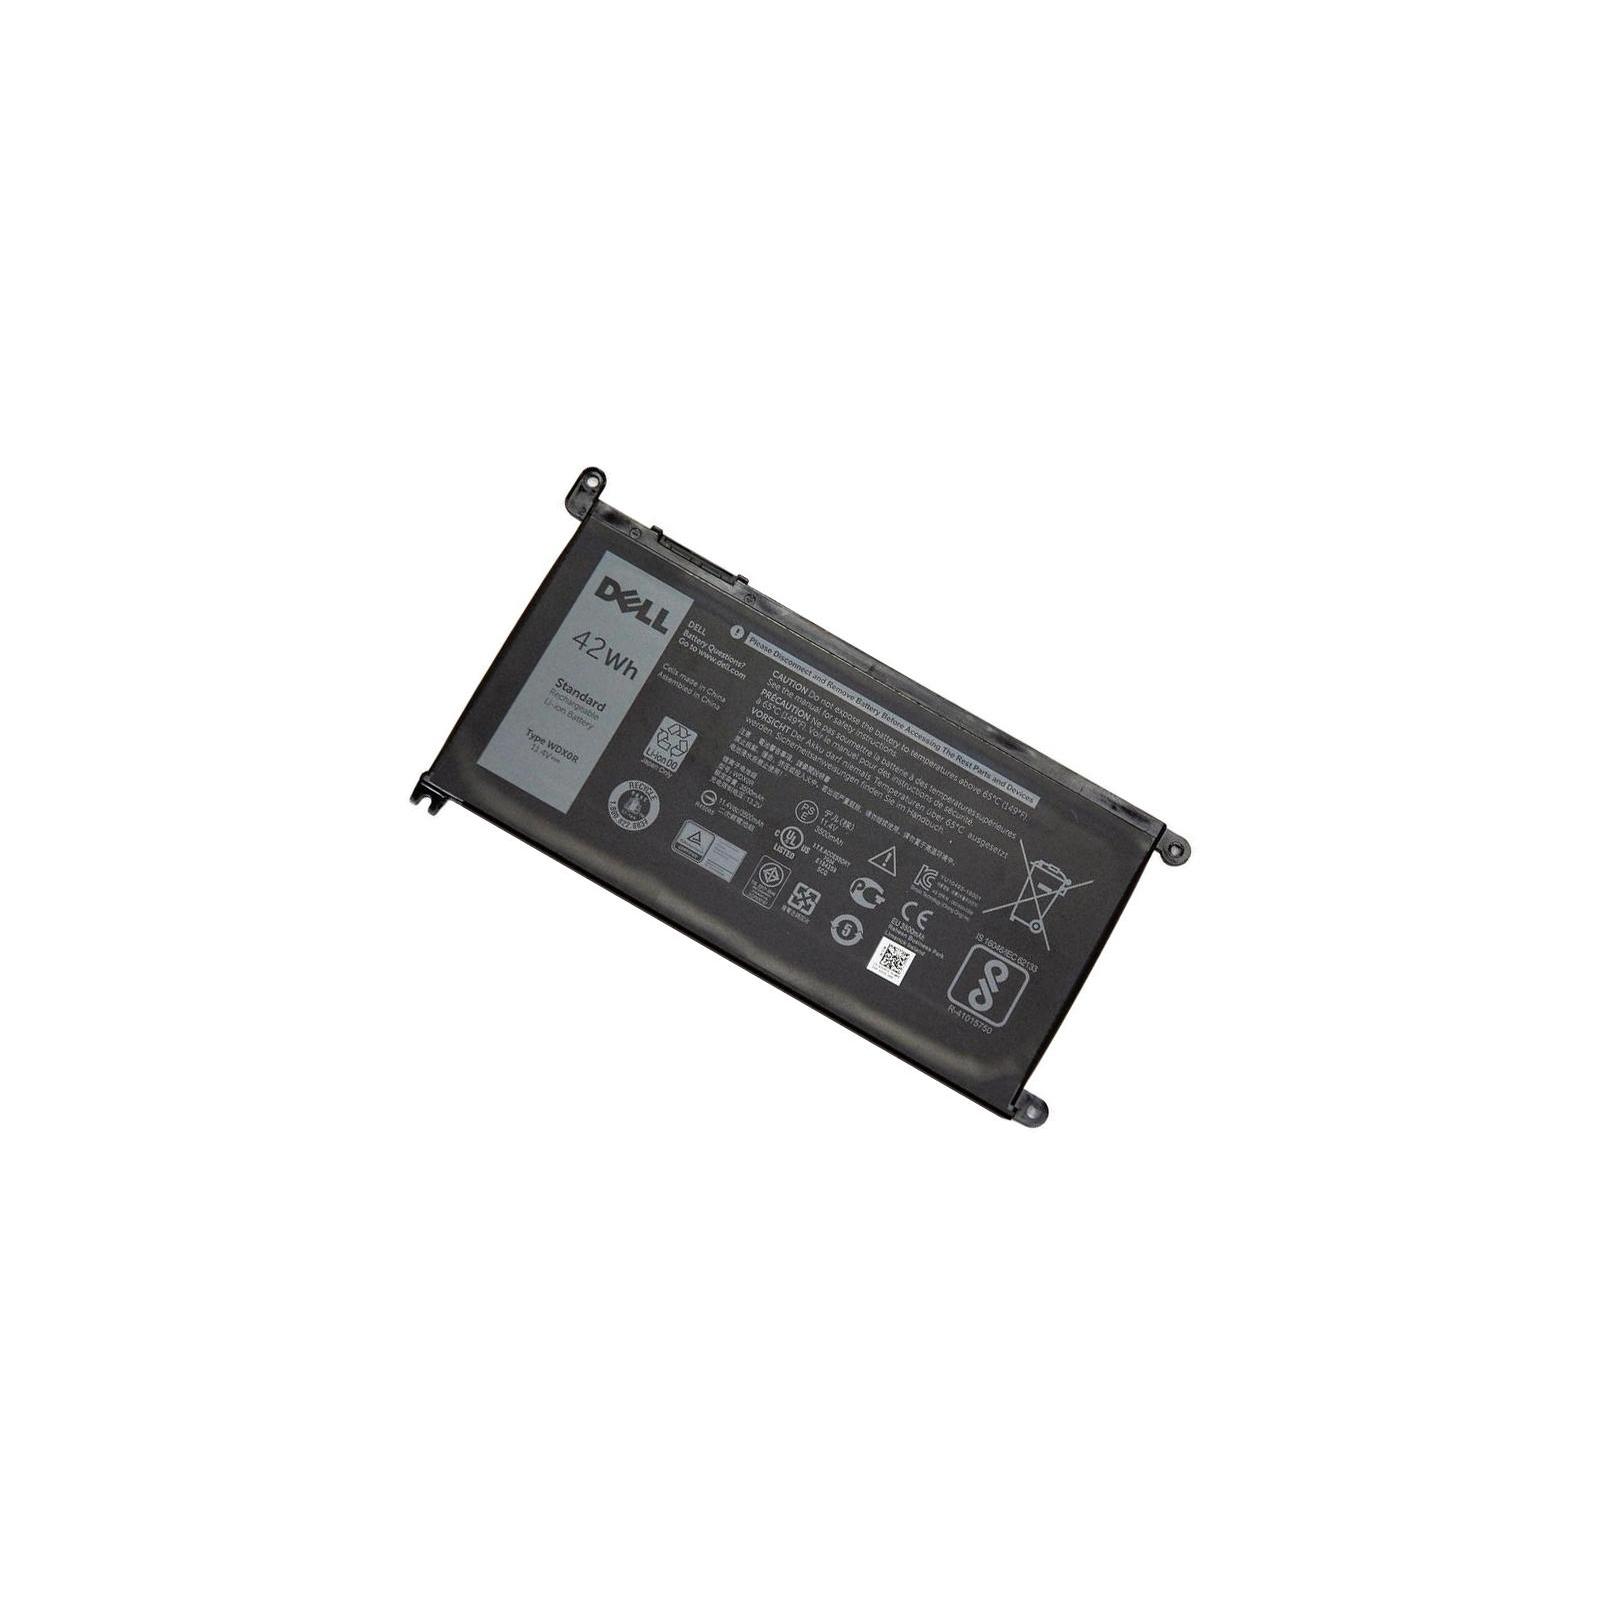 Аккумулятор для ноутбука Dell Inspiron 15-5568 WDX0R, 42Wh (3500mAh), 3cell, 11.4V (A47307) изображение 2